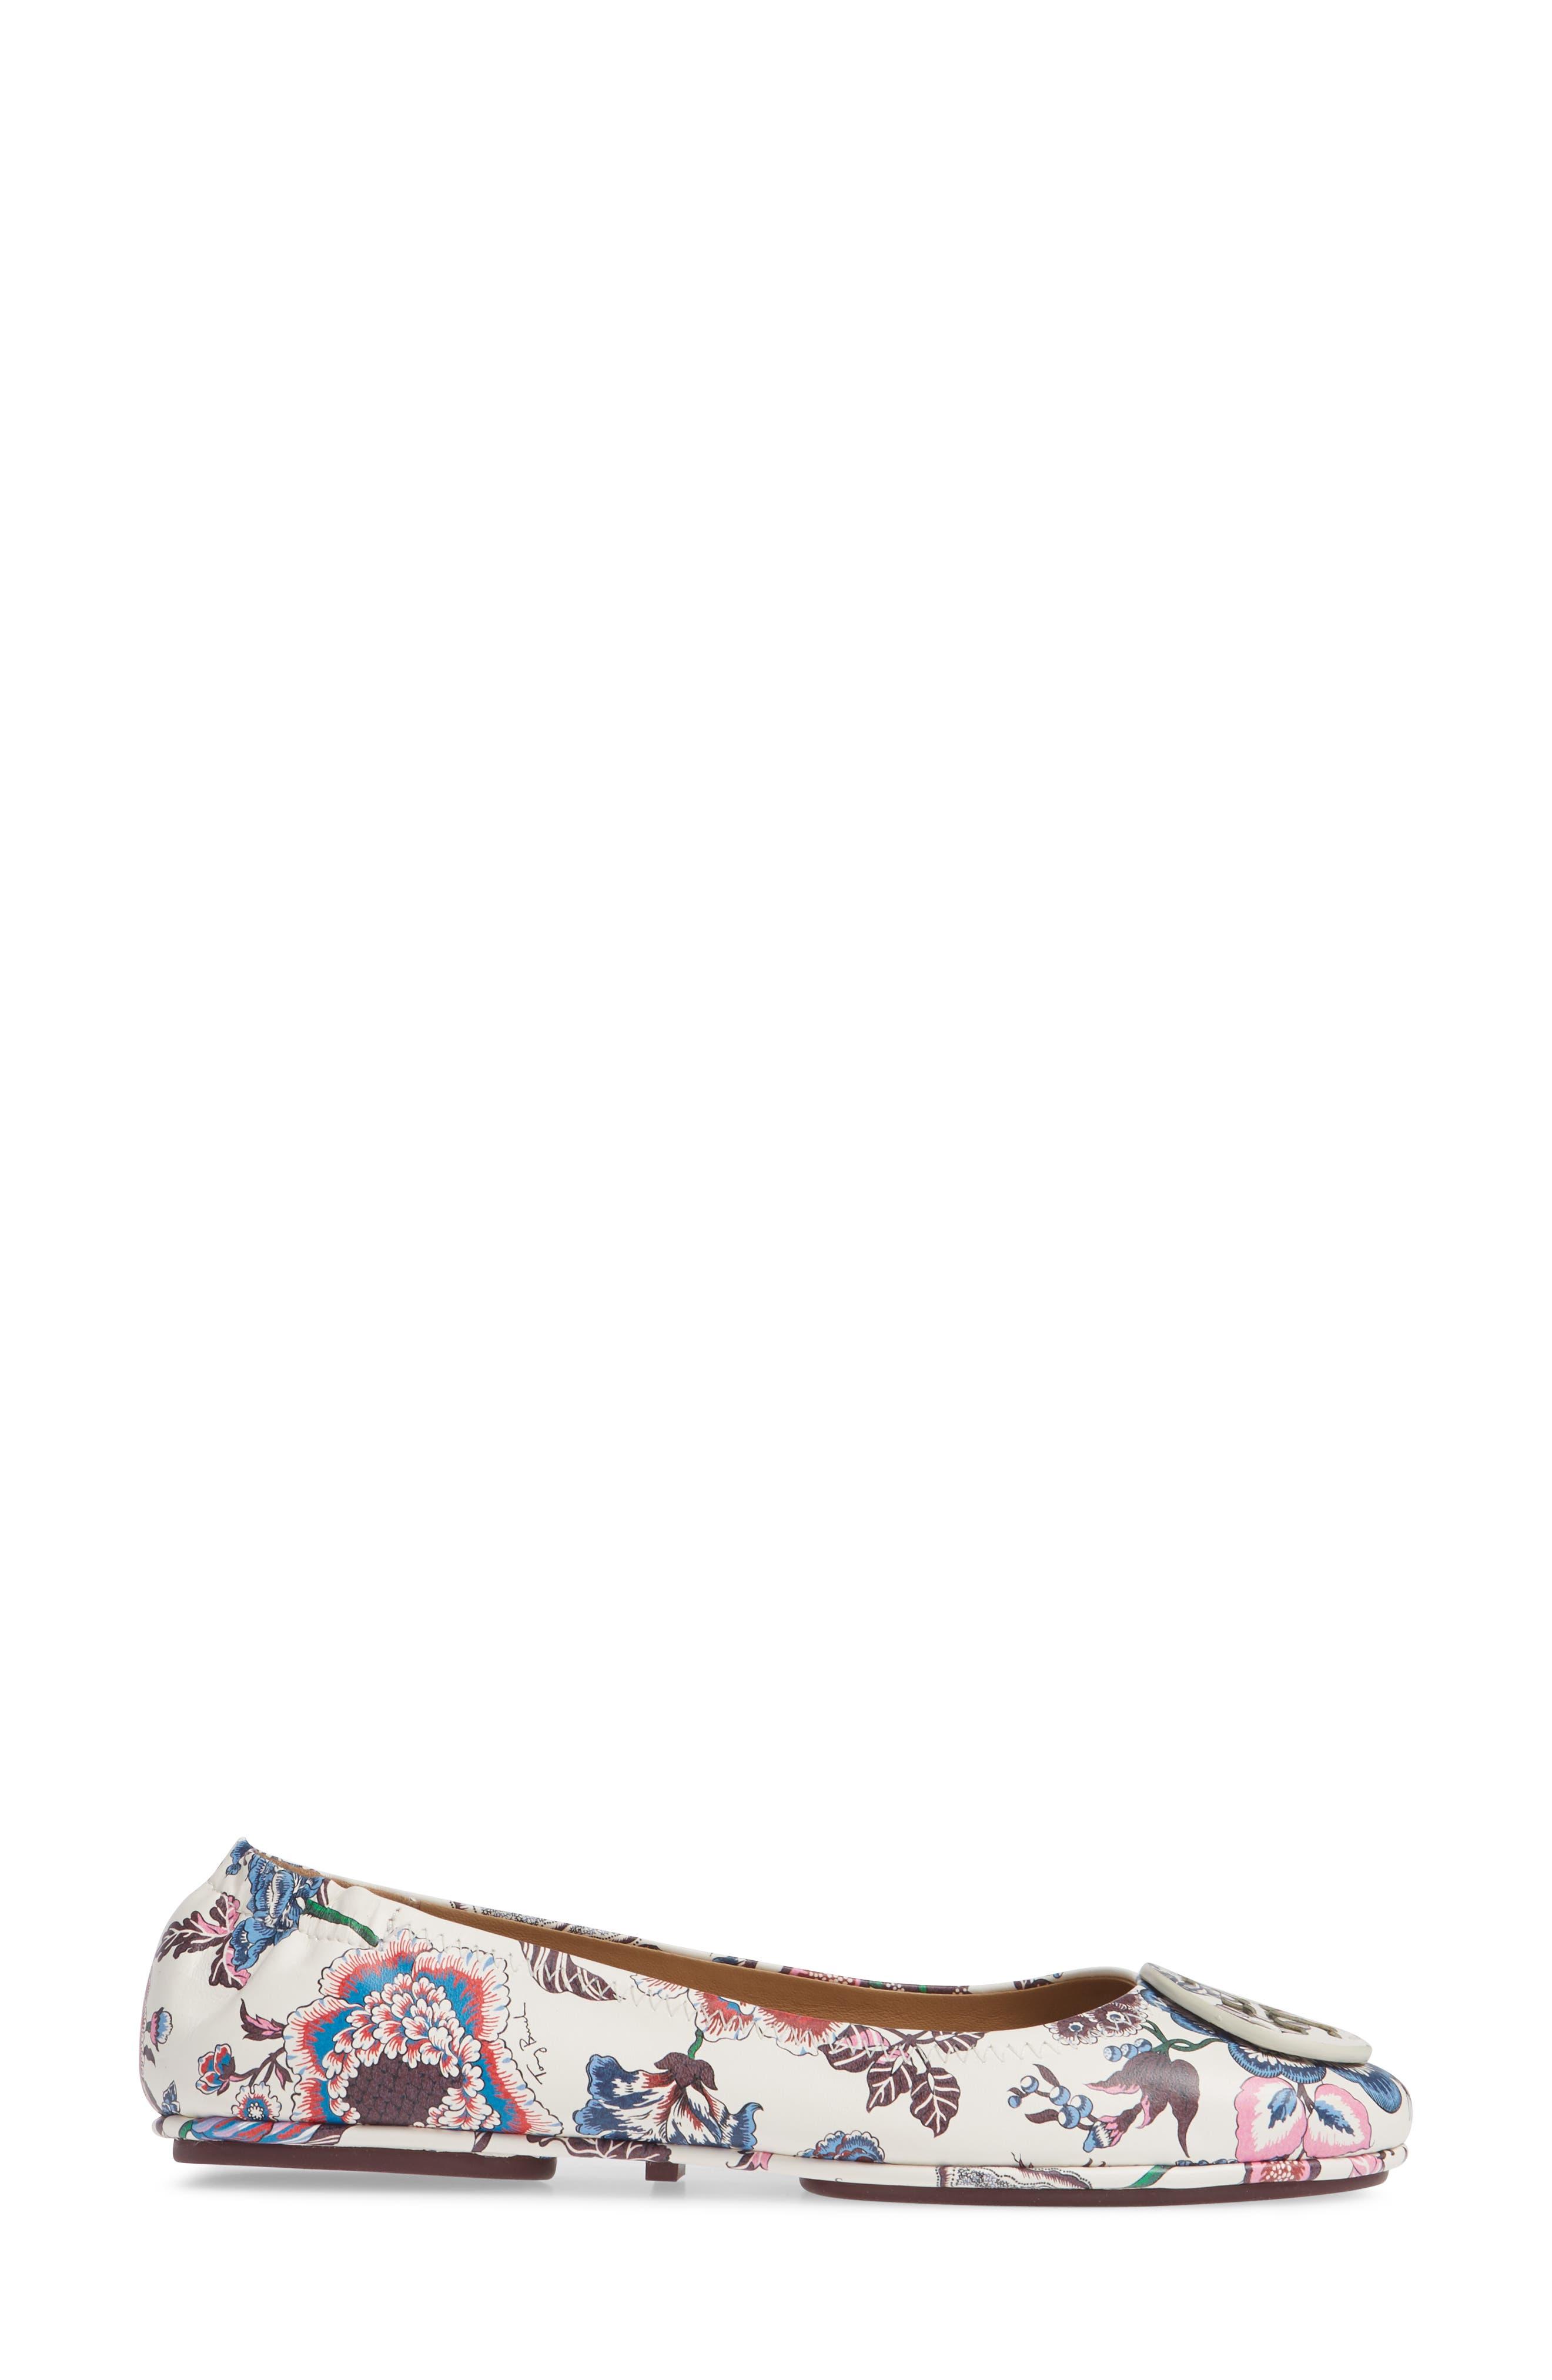 'Minnie' Travel Ballet Flat,                             Alternate thumbnail 143, color,